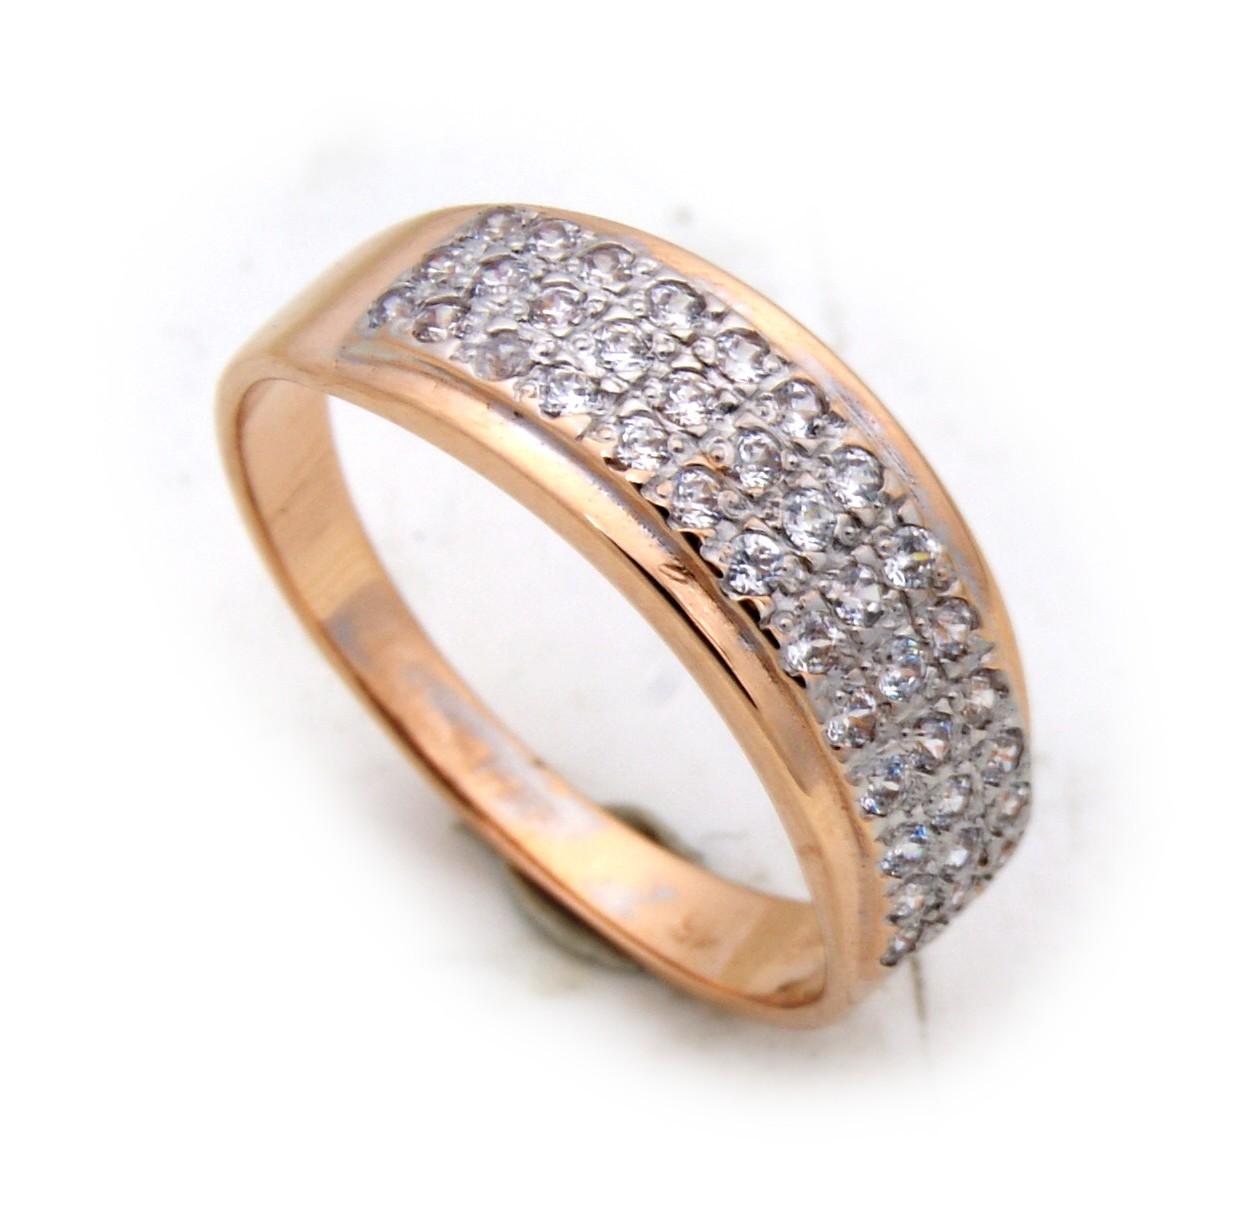 Damen Ring Brillant 0,26 carat wesselton si echt Gold 585 Glanz Rotgold Diamant